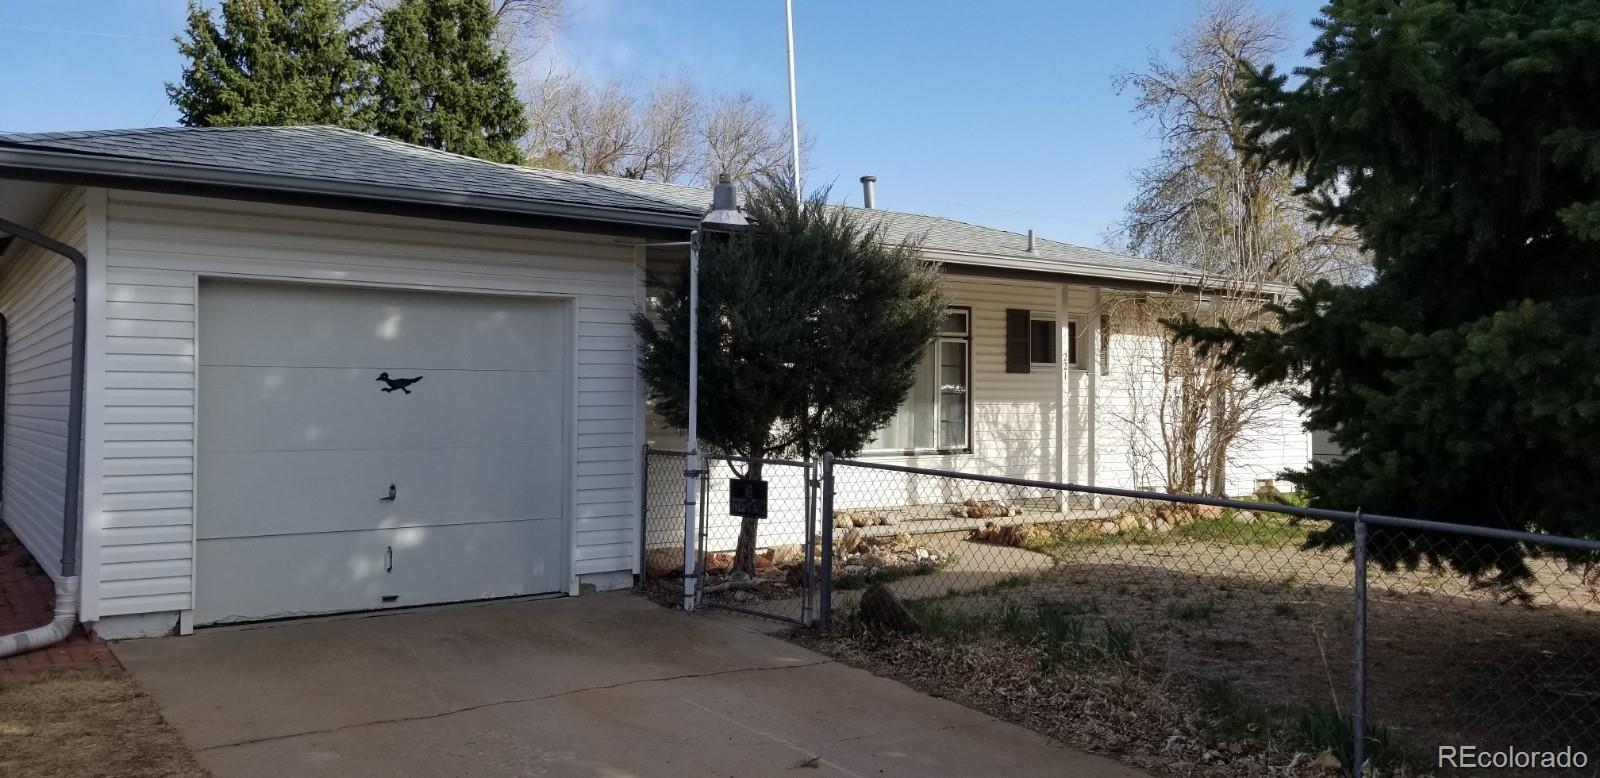 MLS# 3282740 - 2 - 221 Everett Drive, Colorado Springs, CO 80911